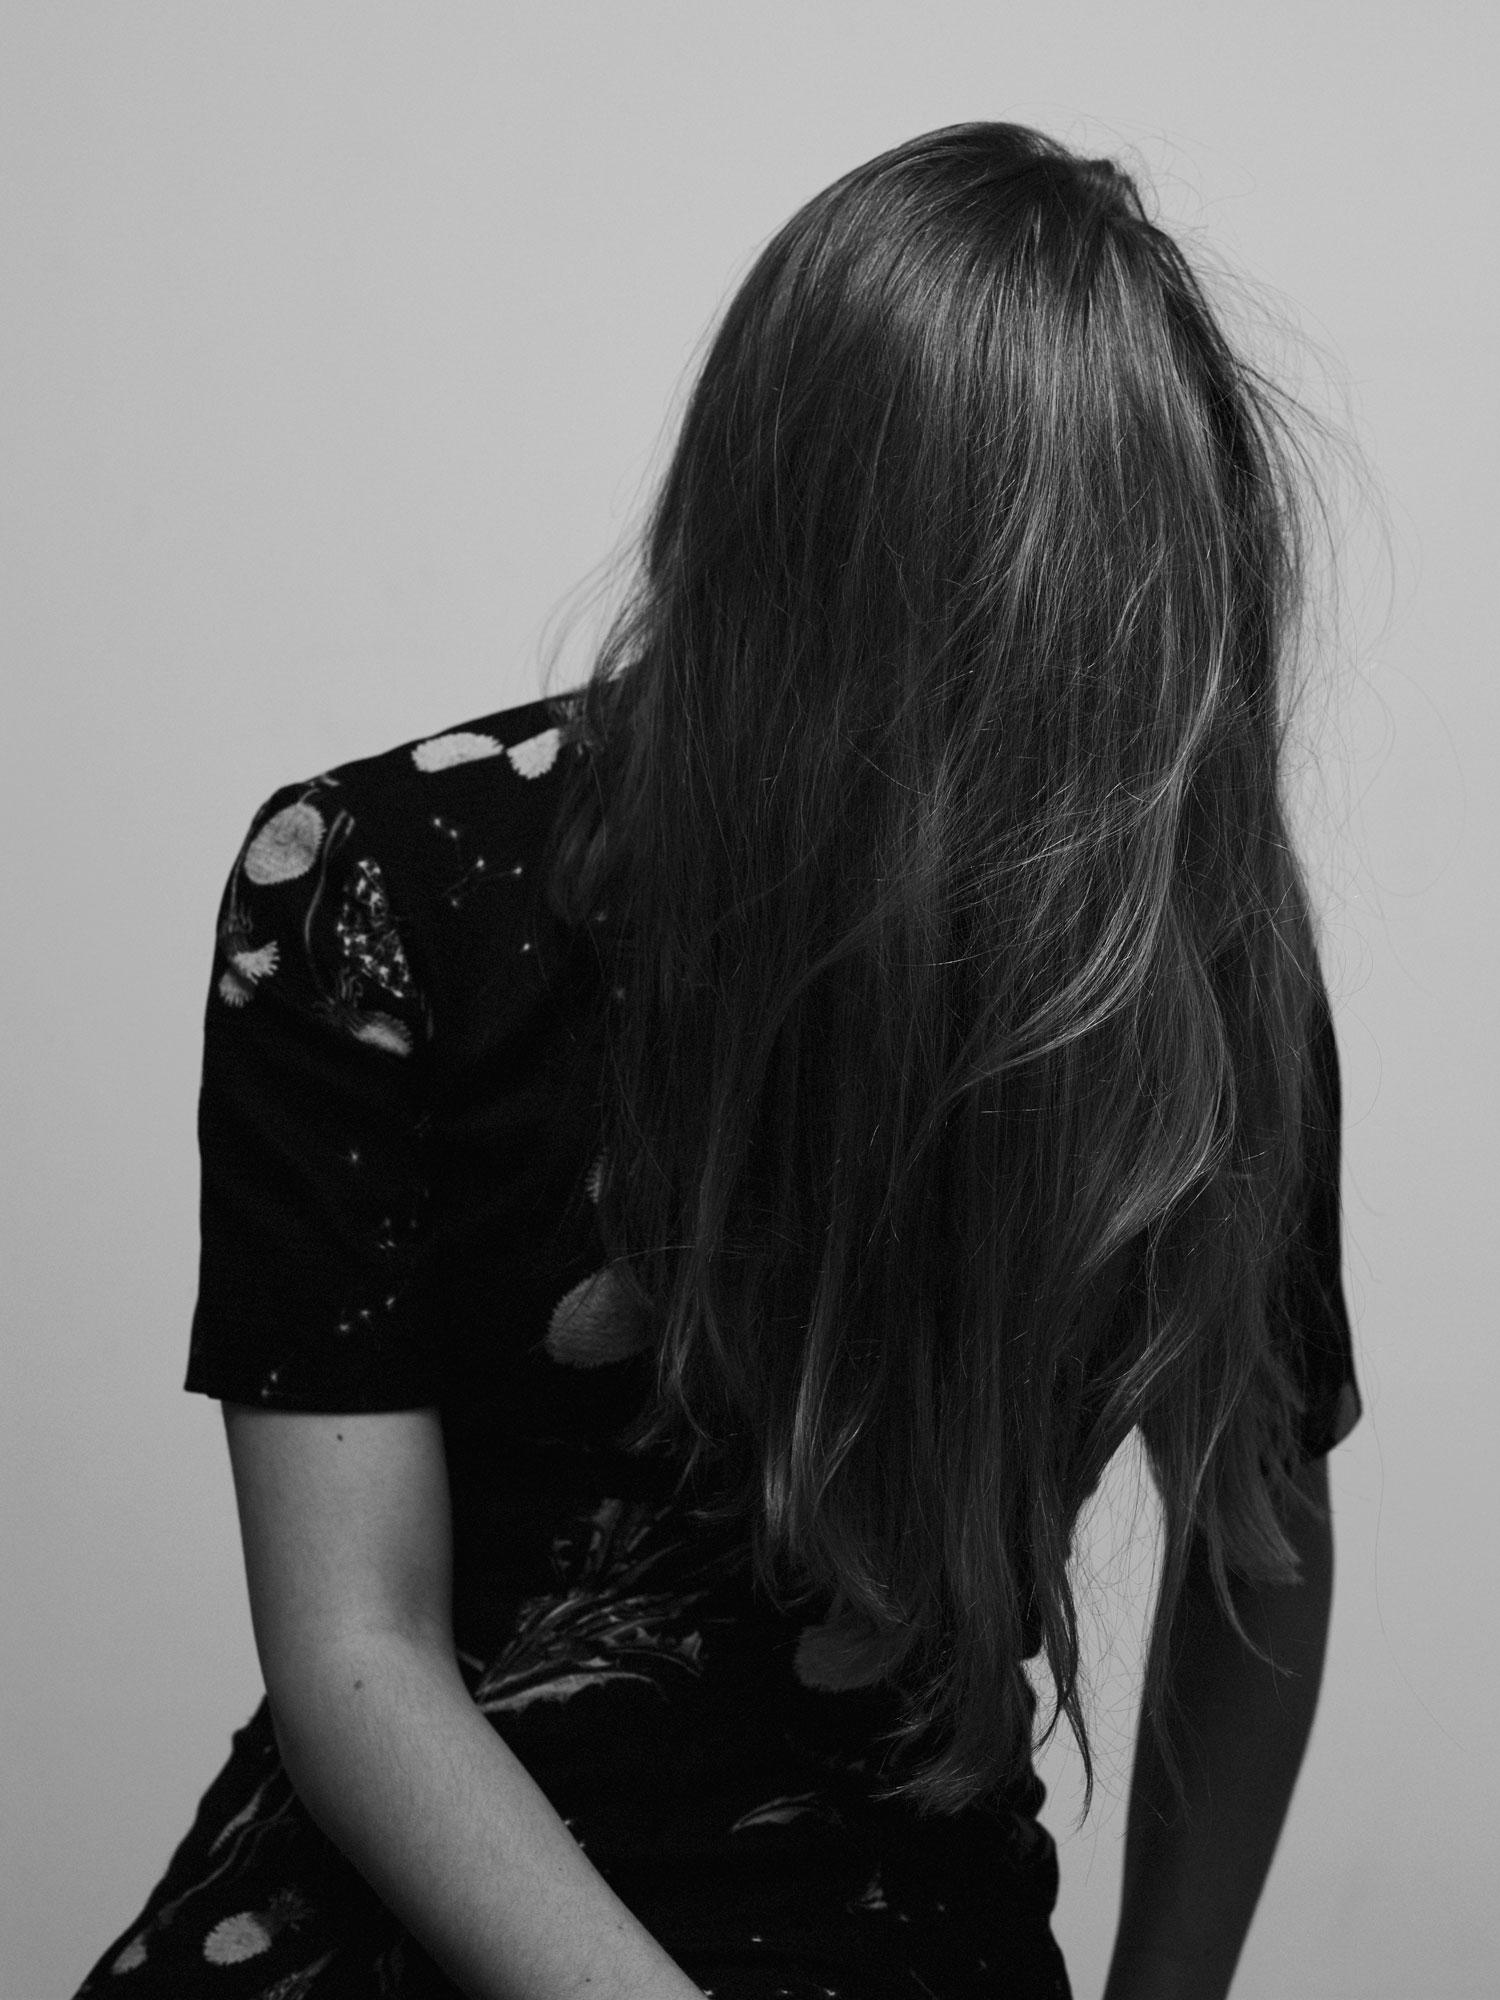 Interview: Photographer Rebecca Scheinberg | Yellowtrace